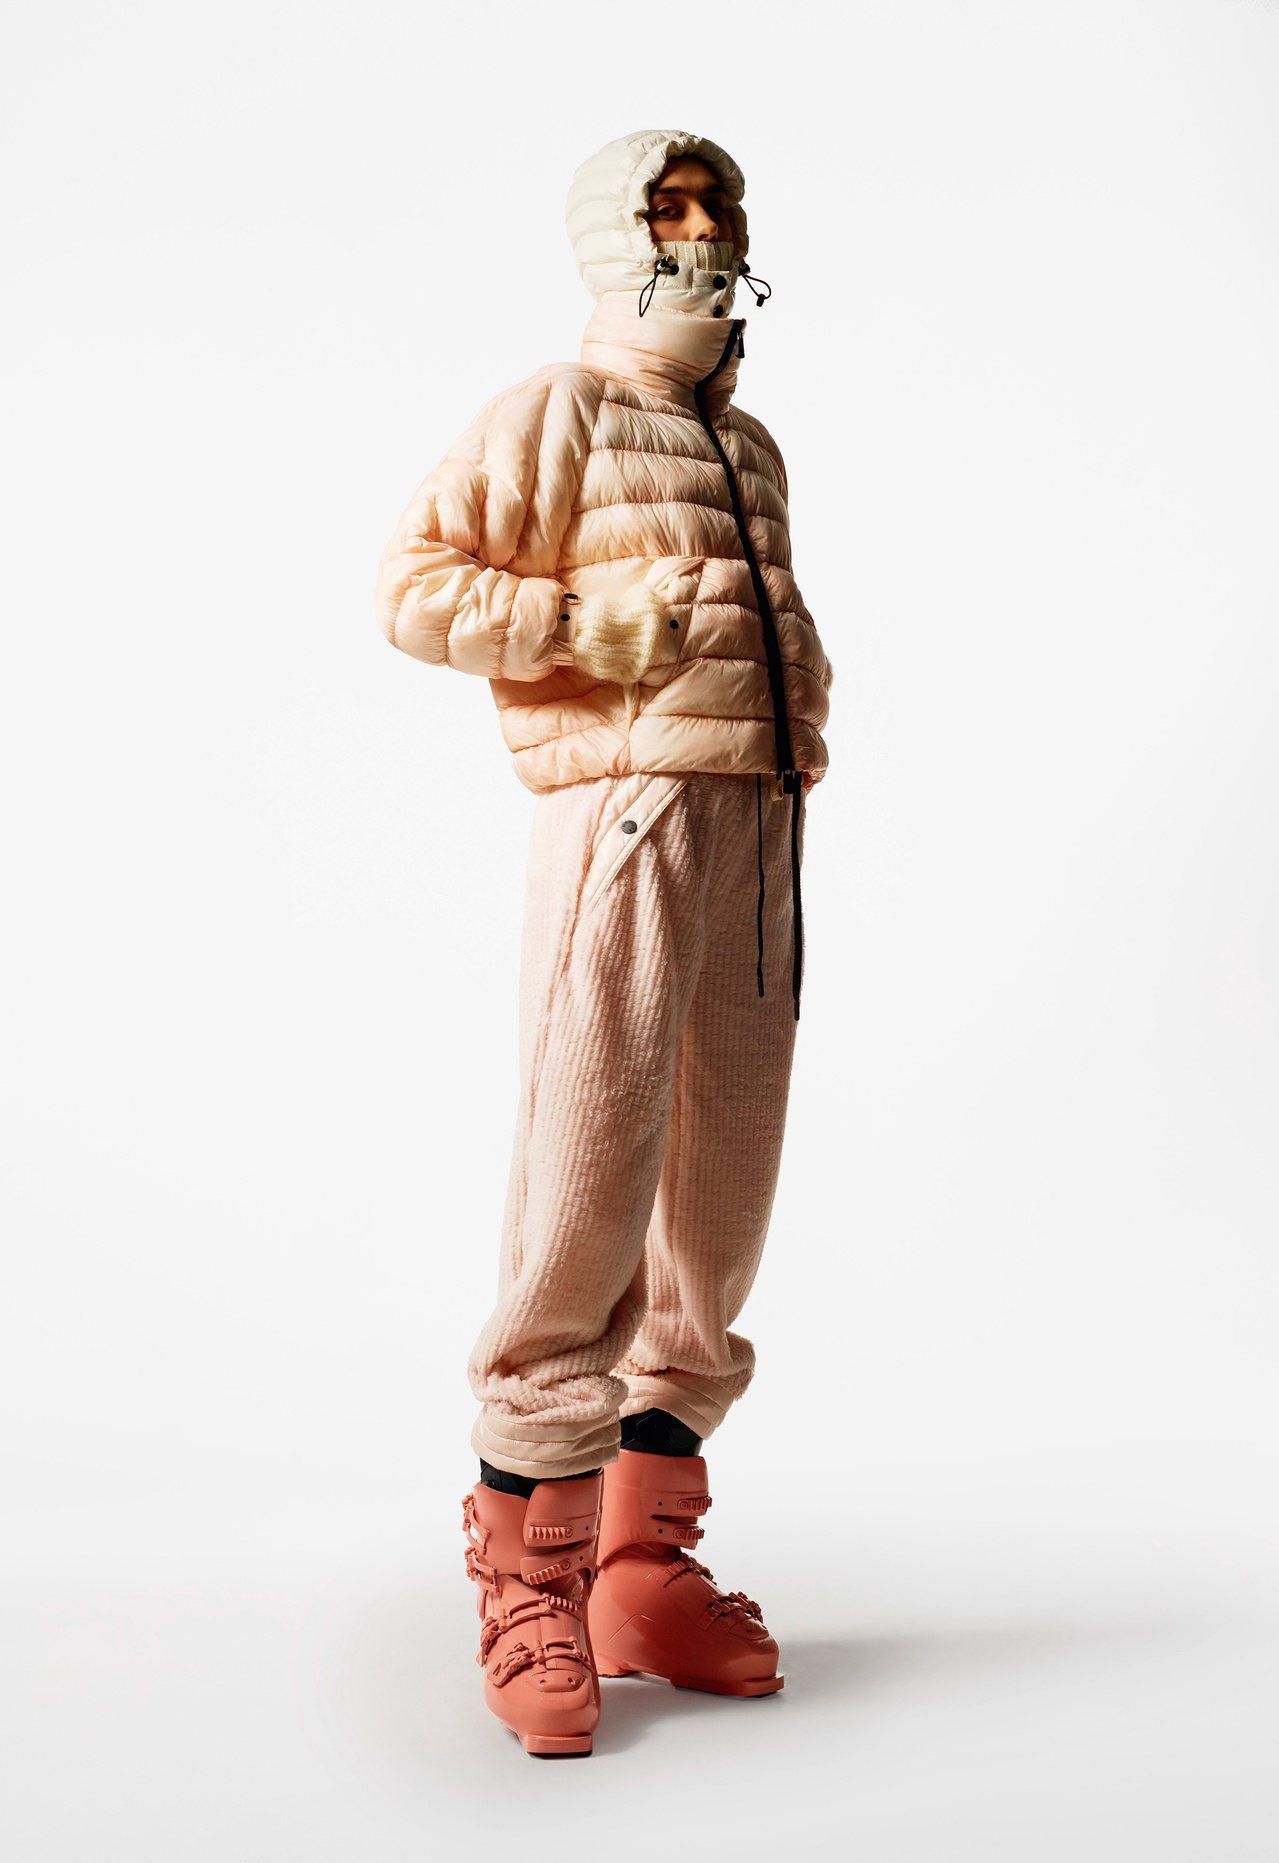 MONCLER Grenoble滑雪系列的女裝,推出玫瑰裸粉色的浪漫色彩。 圖/...